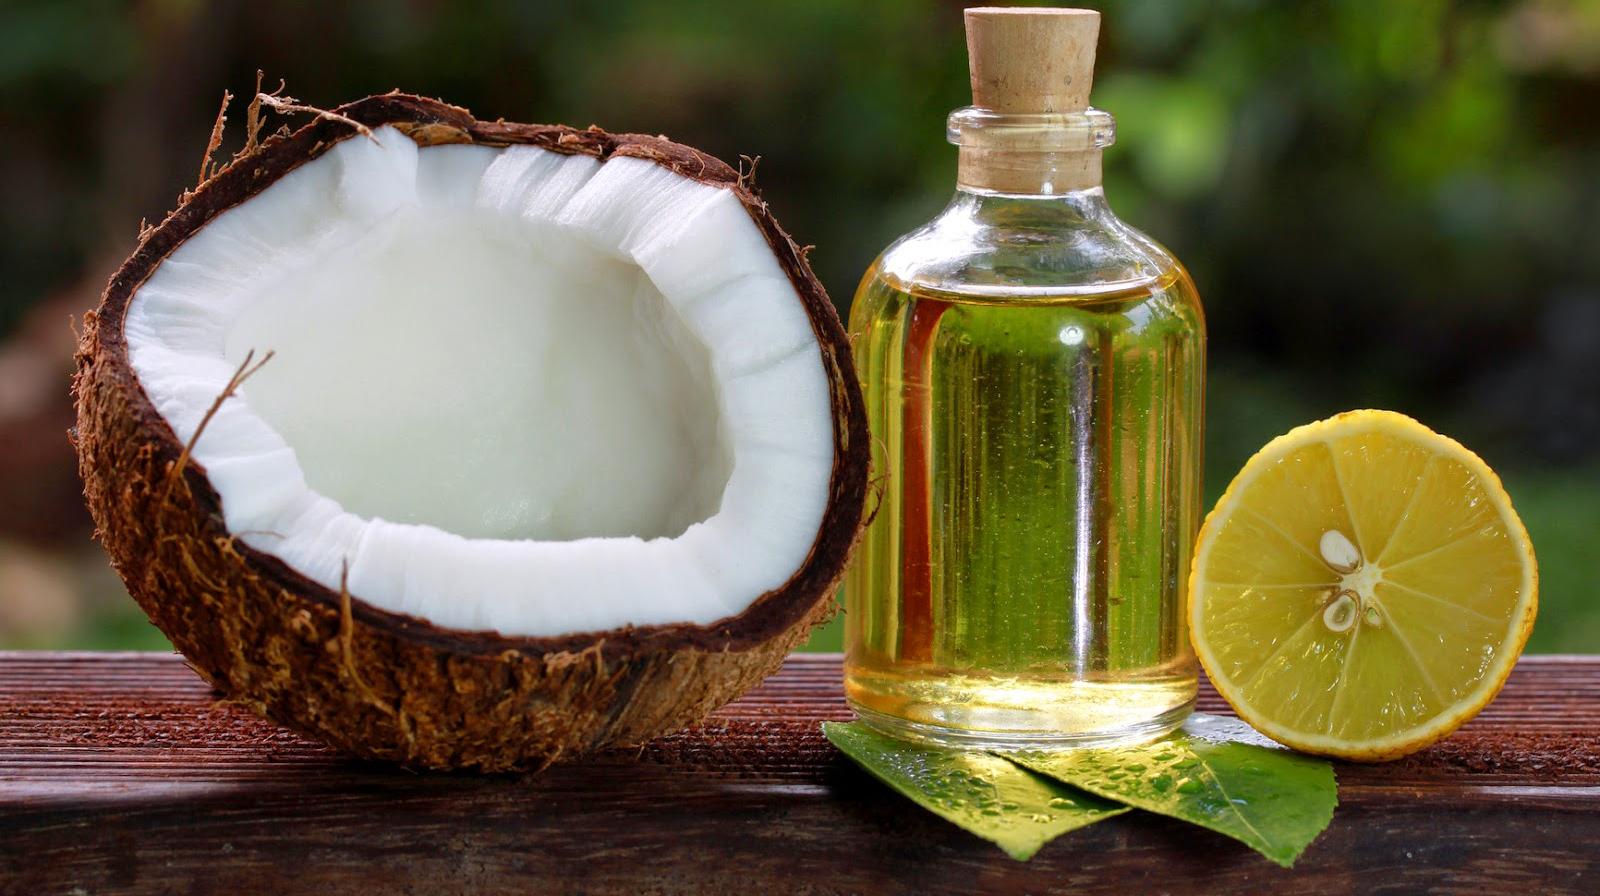 erotic essential massage oils, massage oils,